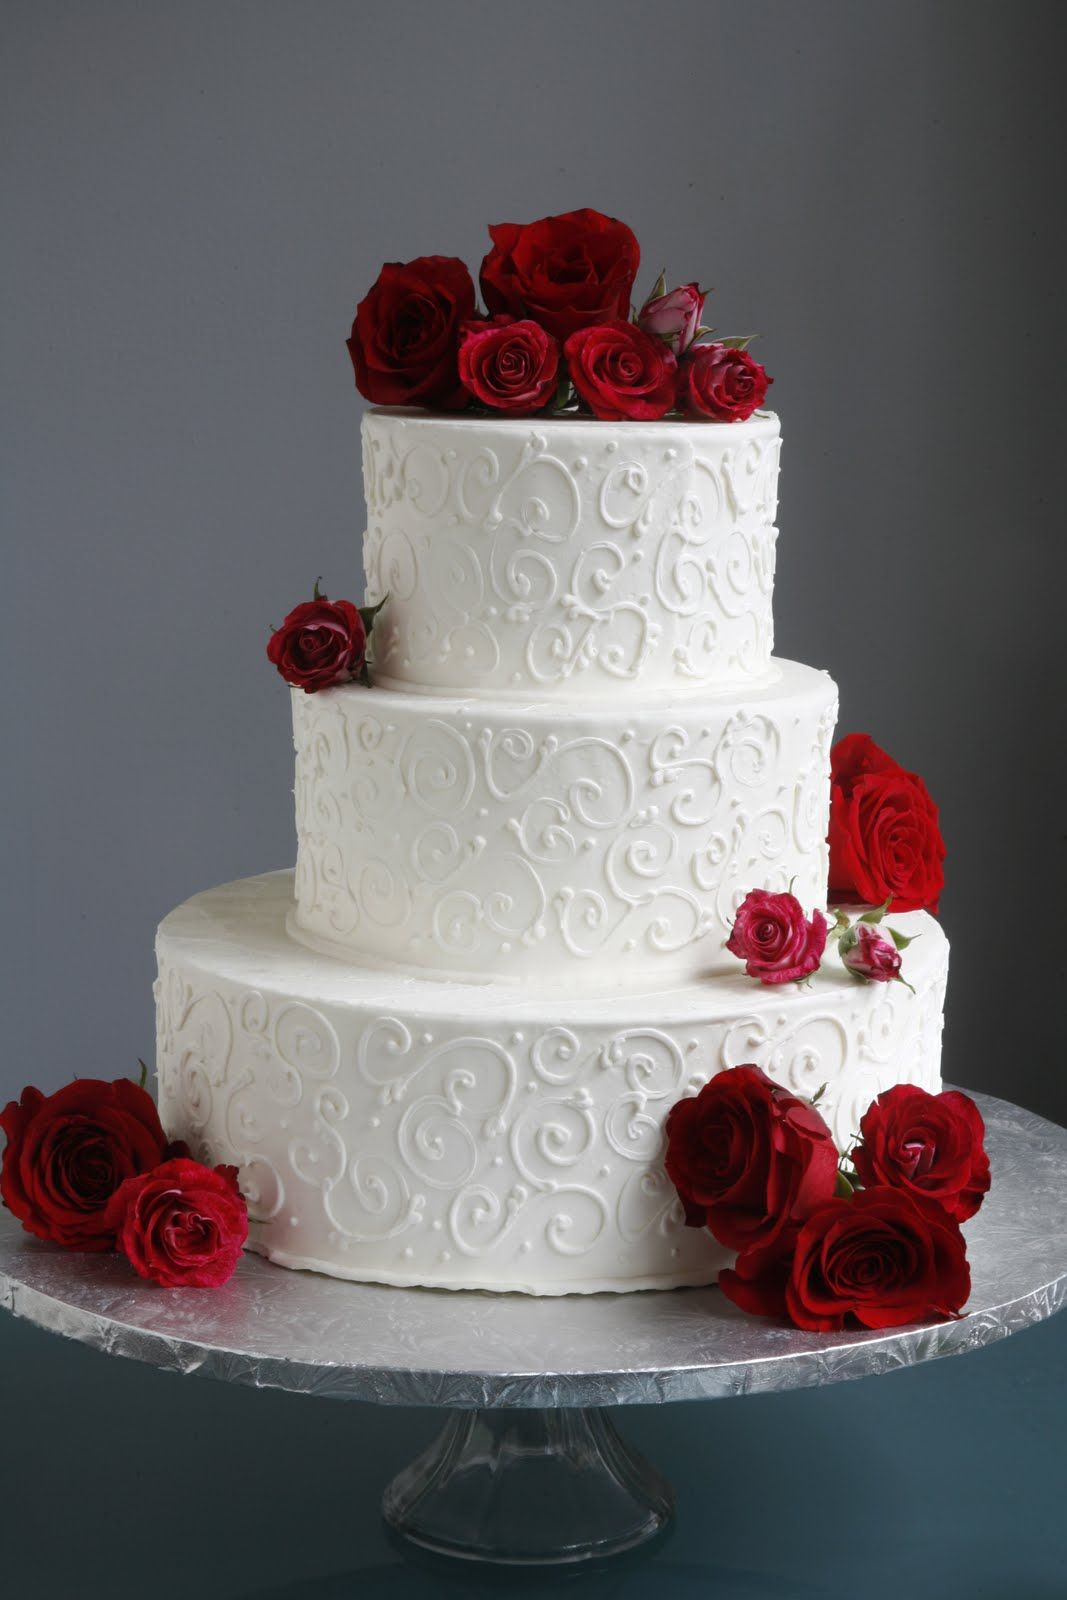 Single Tier Wedding Cakes with Fresh Flowers